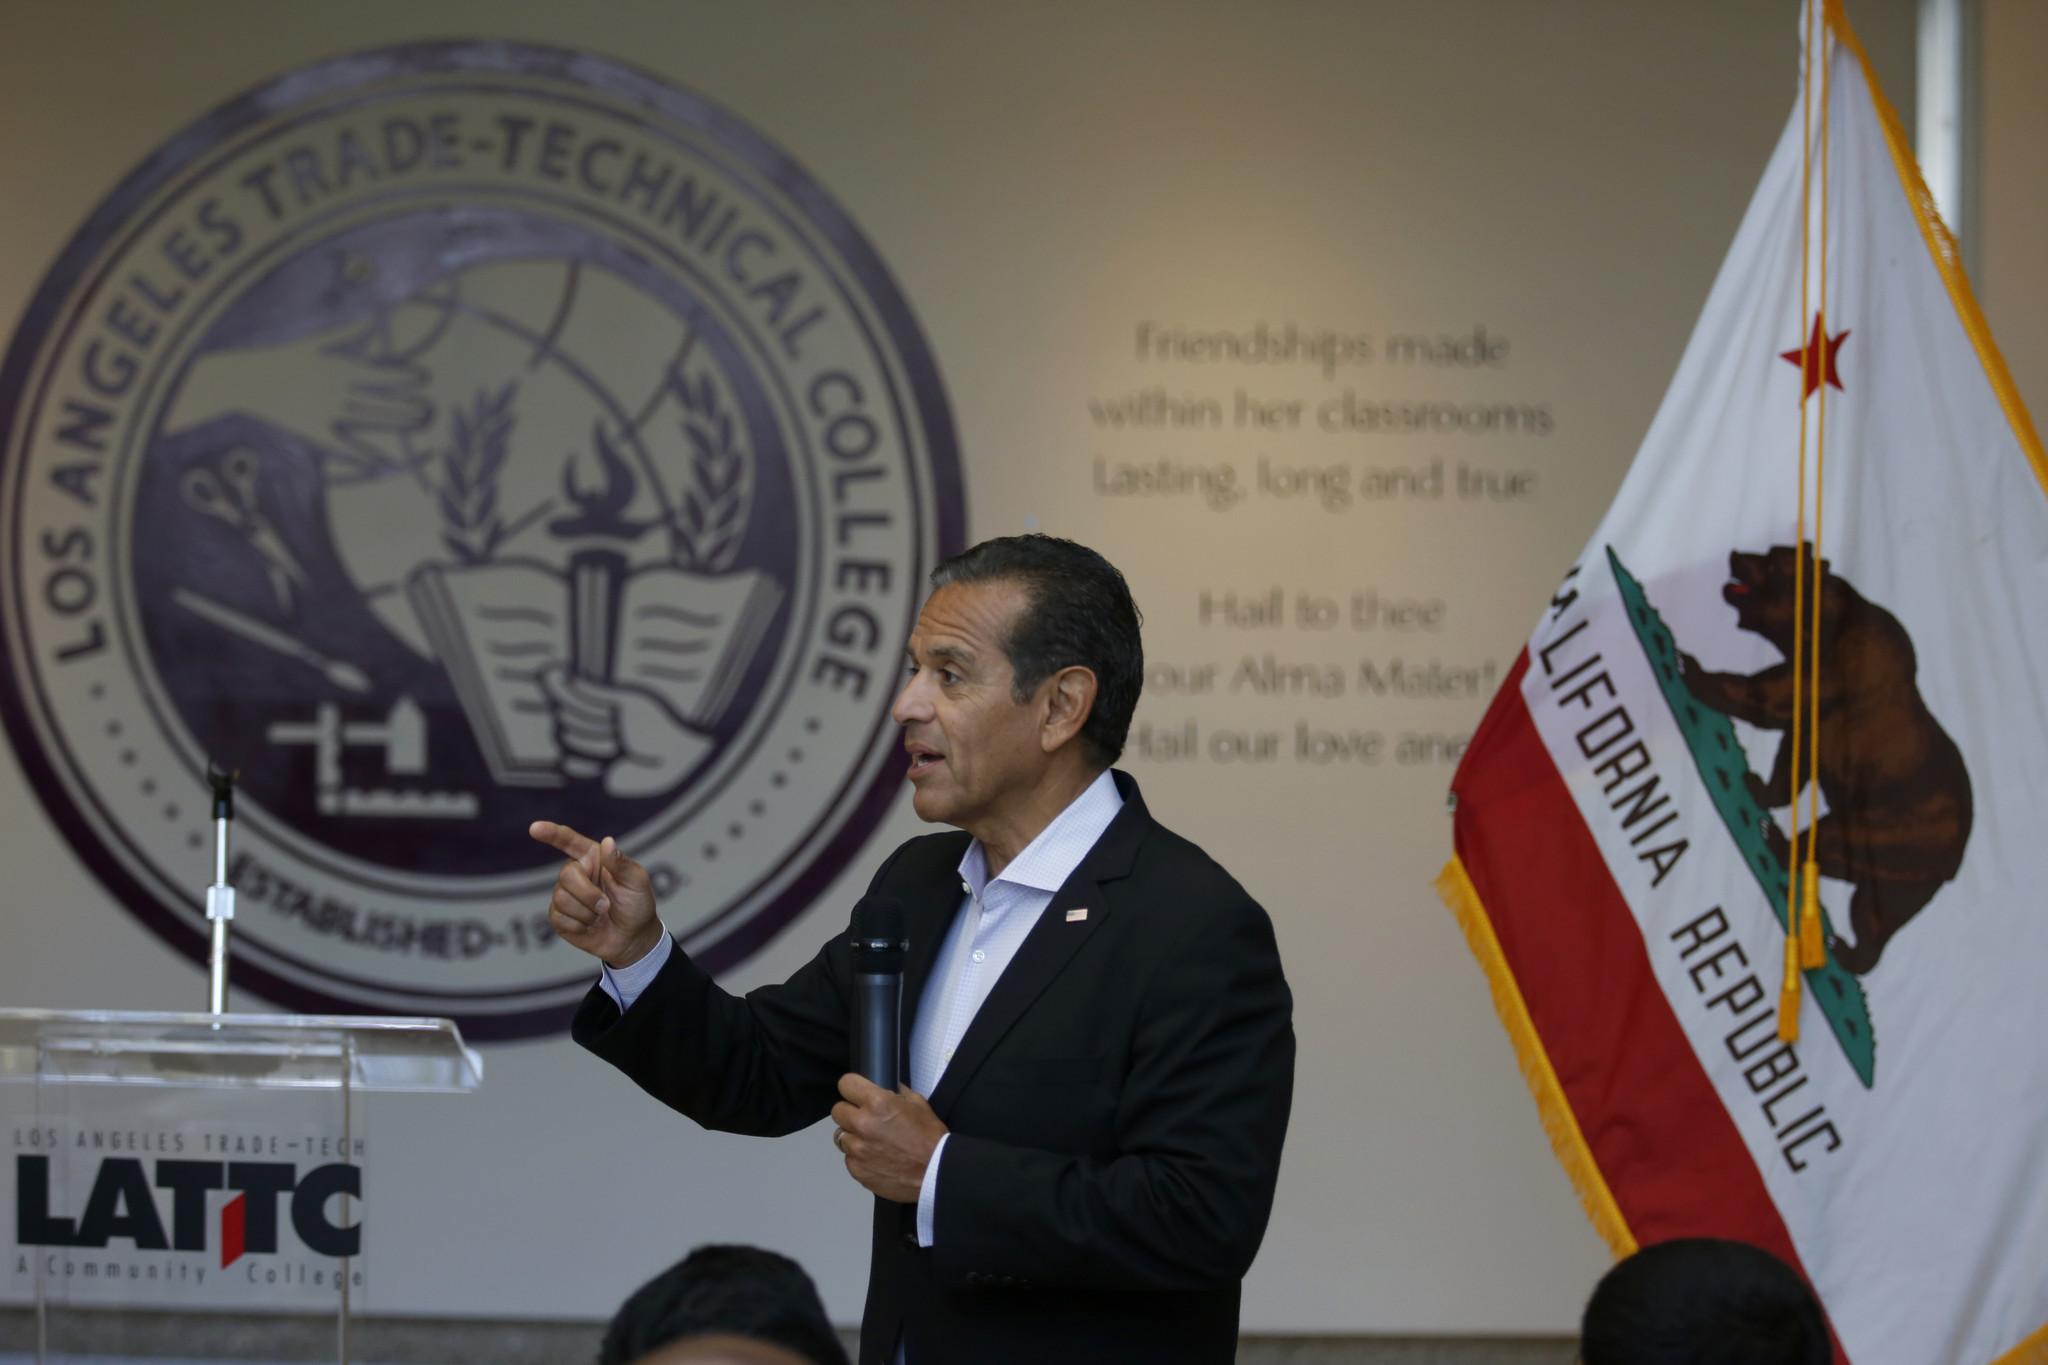 Former Los Angeles Mayor Antonio Villaraigosa speaks at at Los Angeles Trade-Technical College on Aug. 29. (Francine Orr / Los Angeles Times)